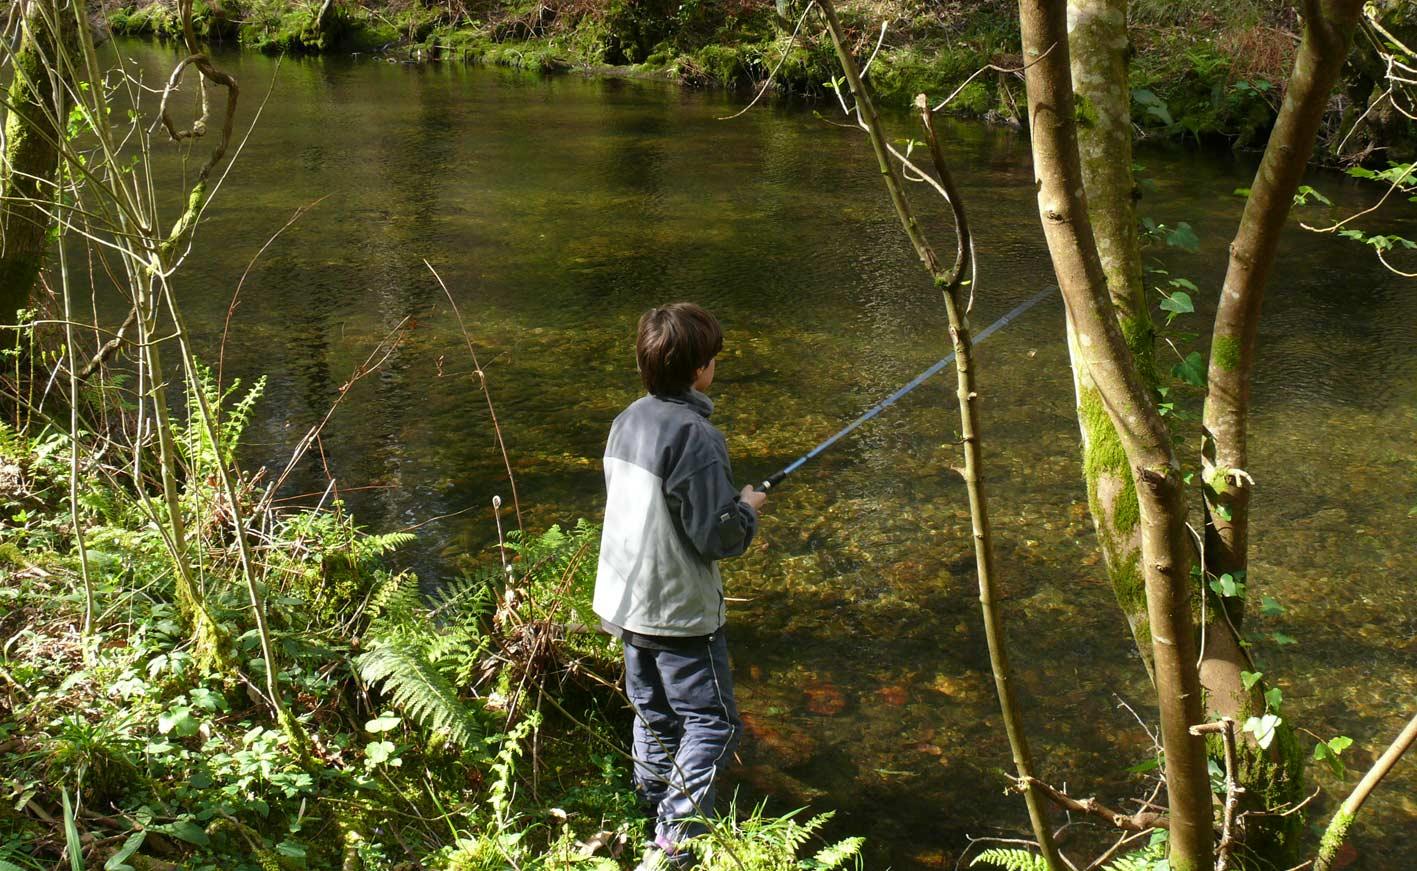 Coto de pesca